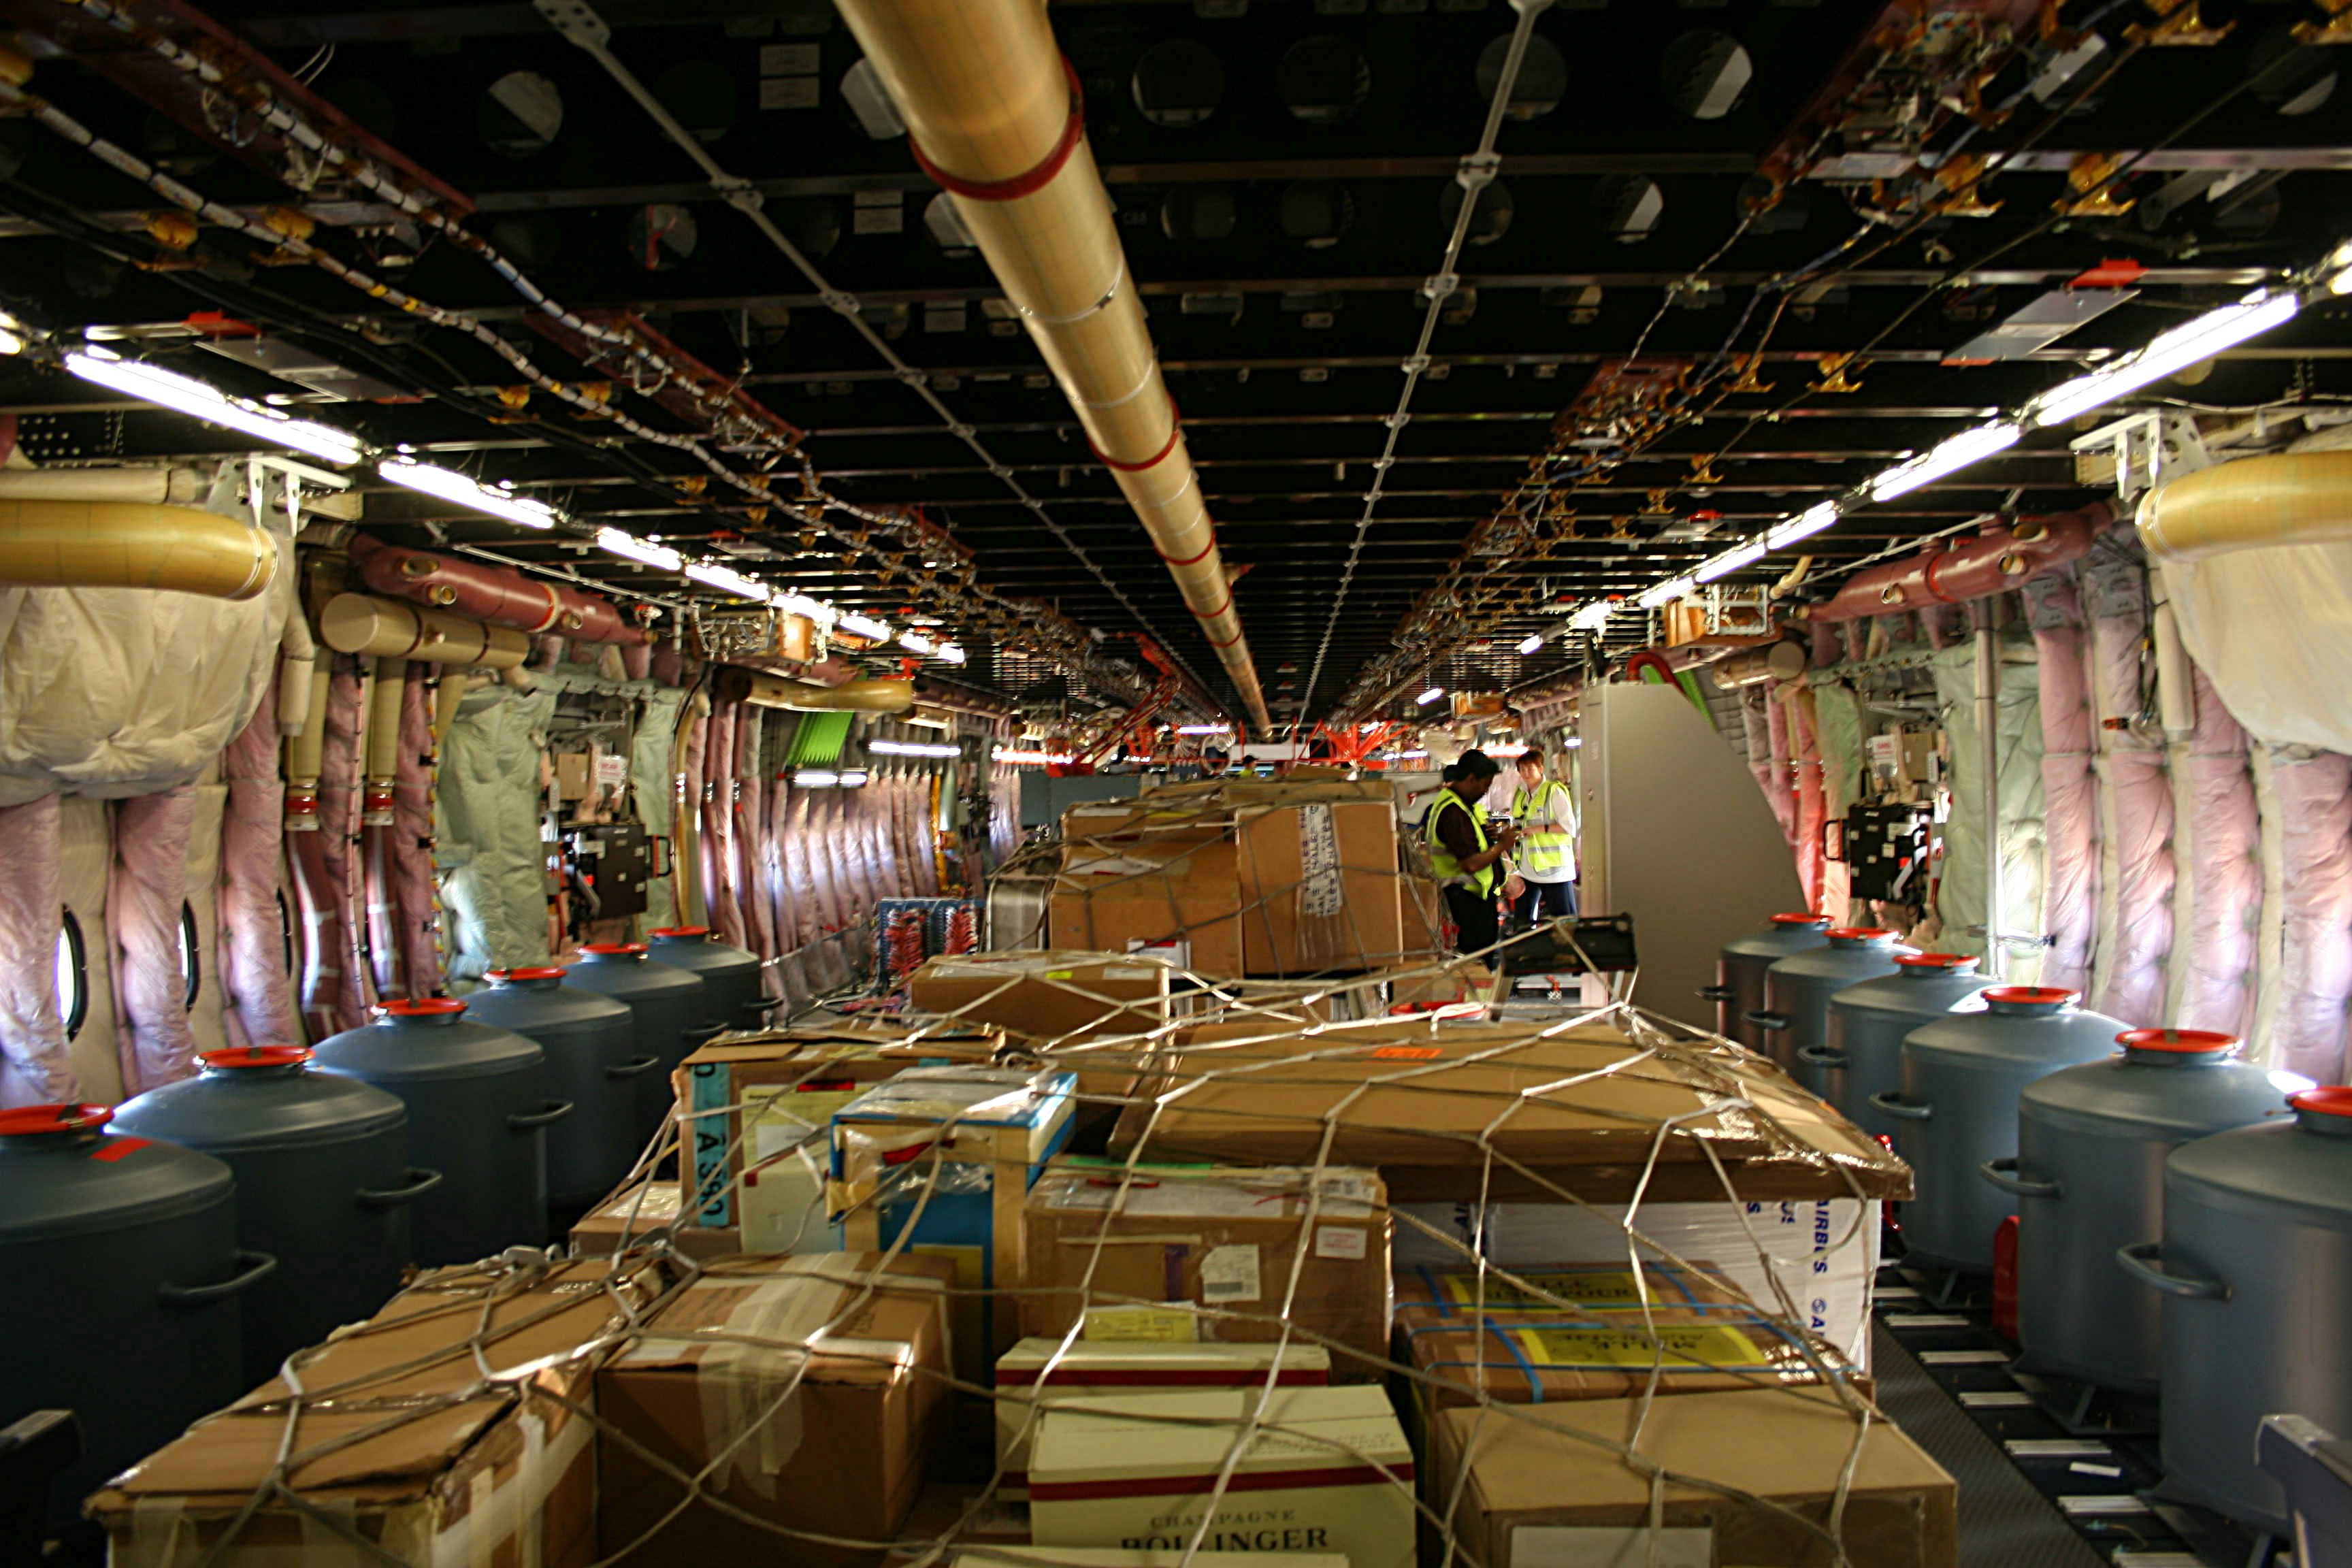 File Test A380 Lower Deck Jpg Wikimedia Commons